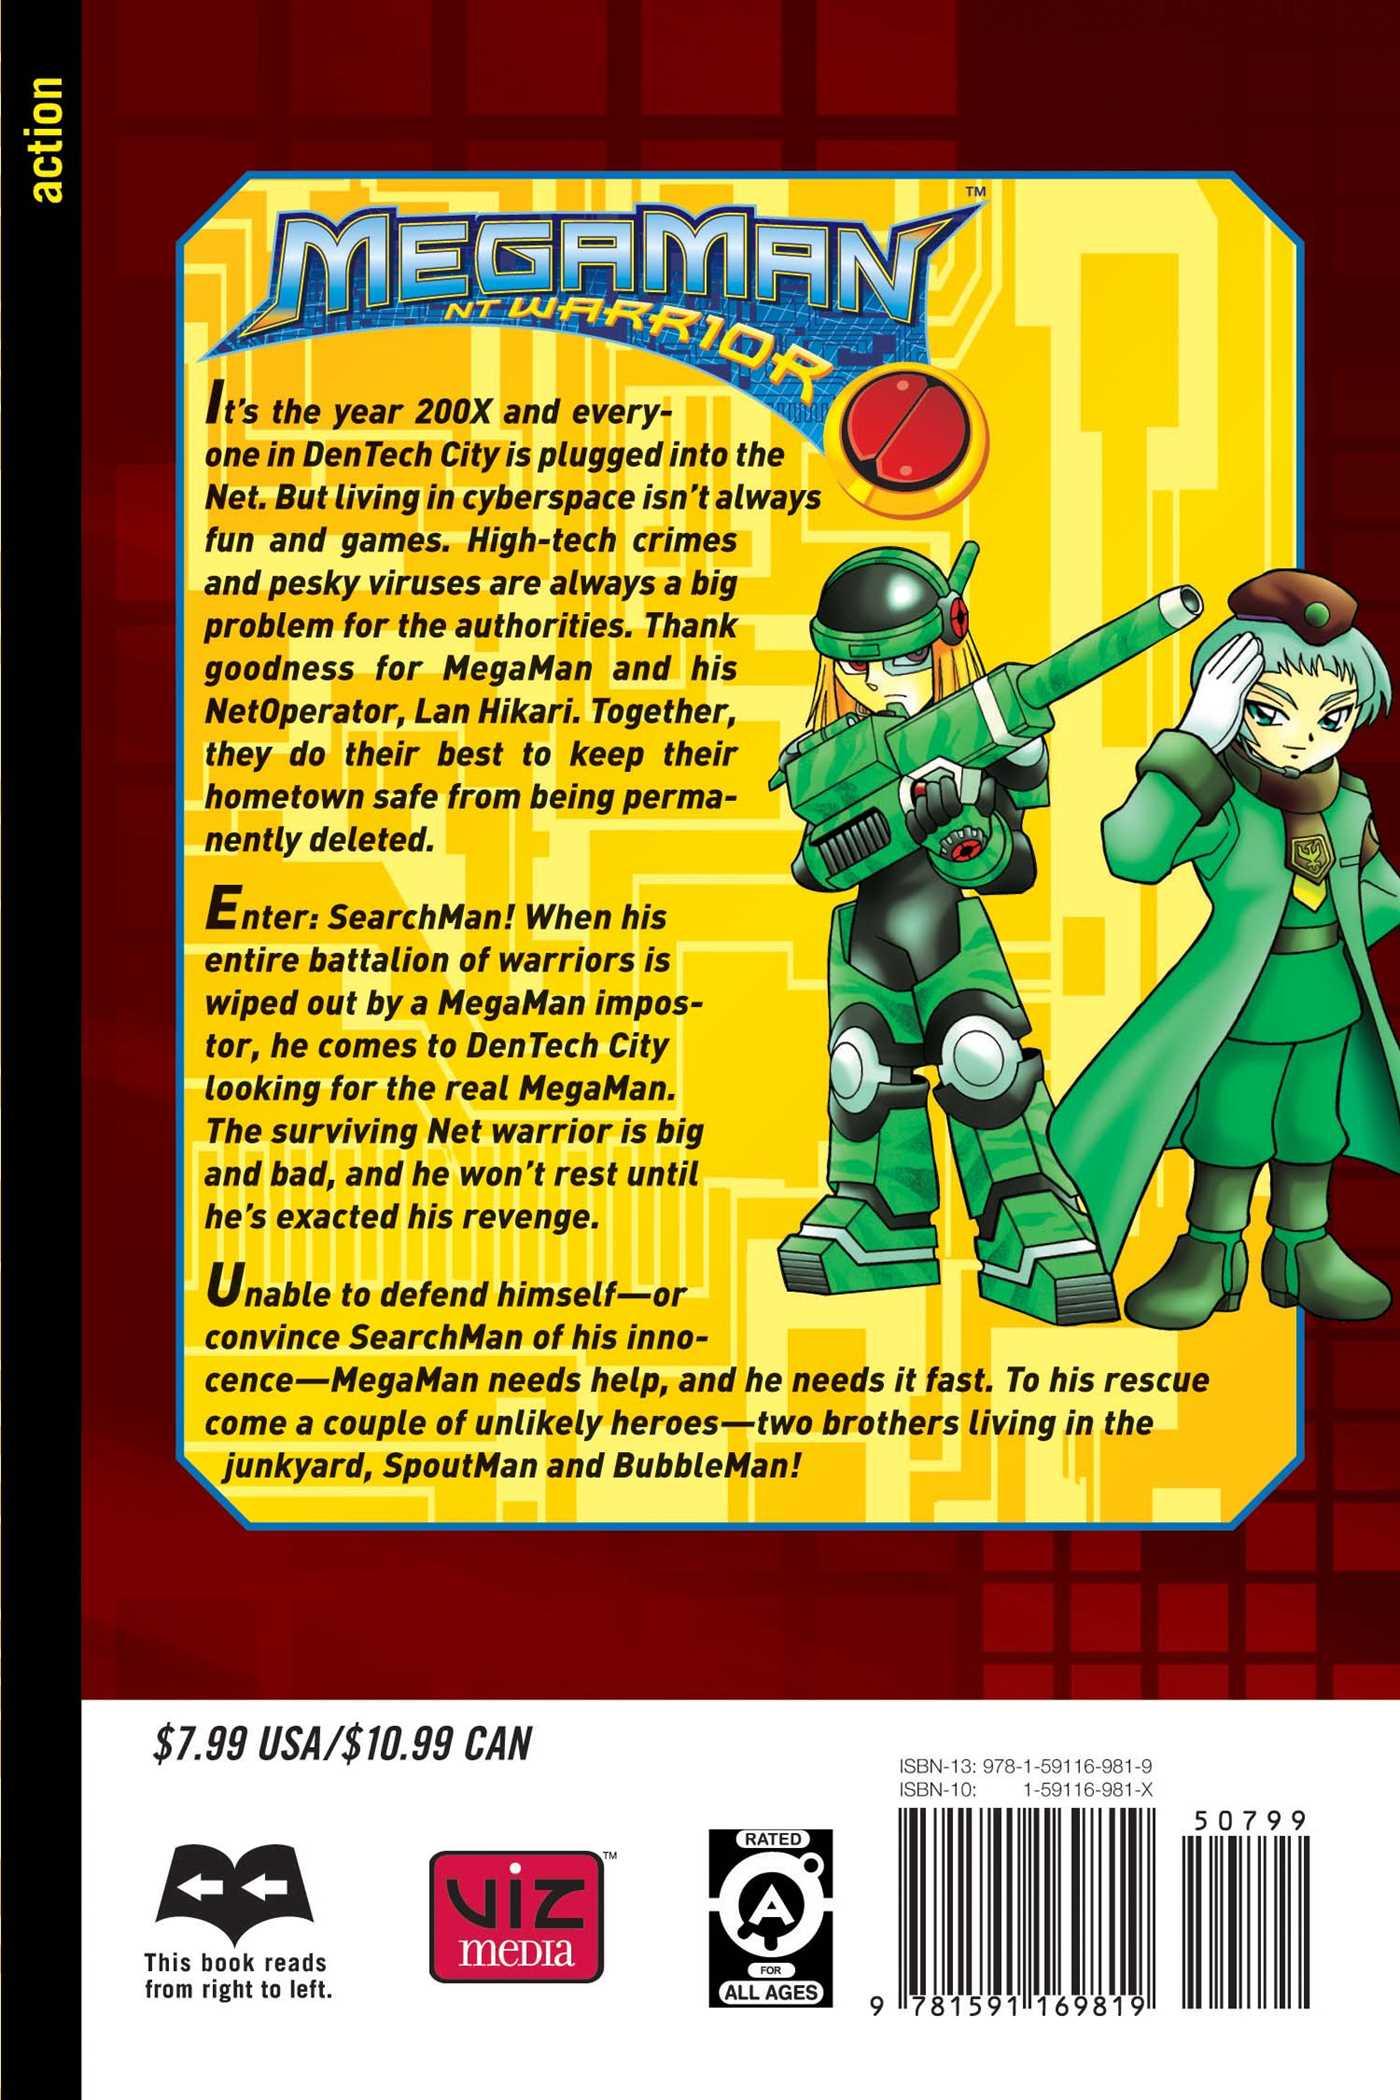 Megaman: NT Warrior in Colour by Naltaca on DeviantArt